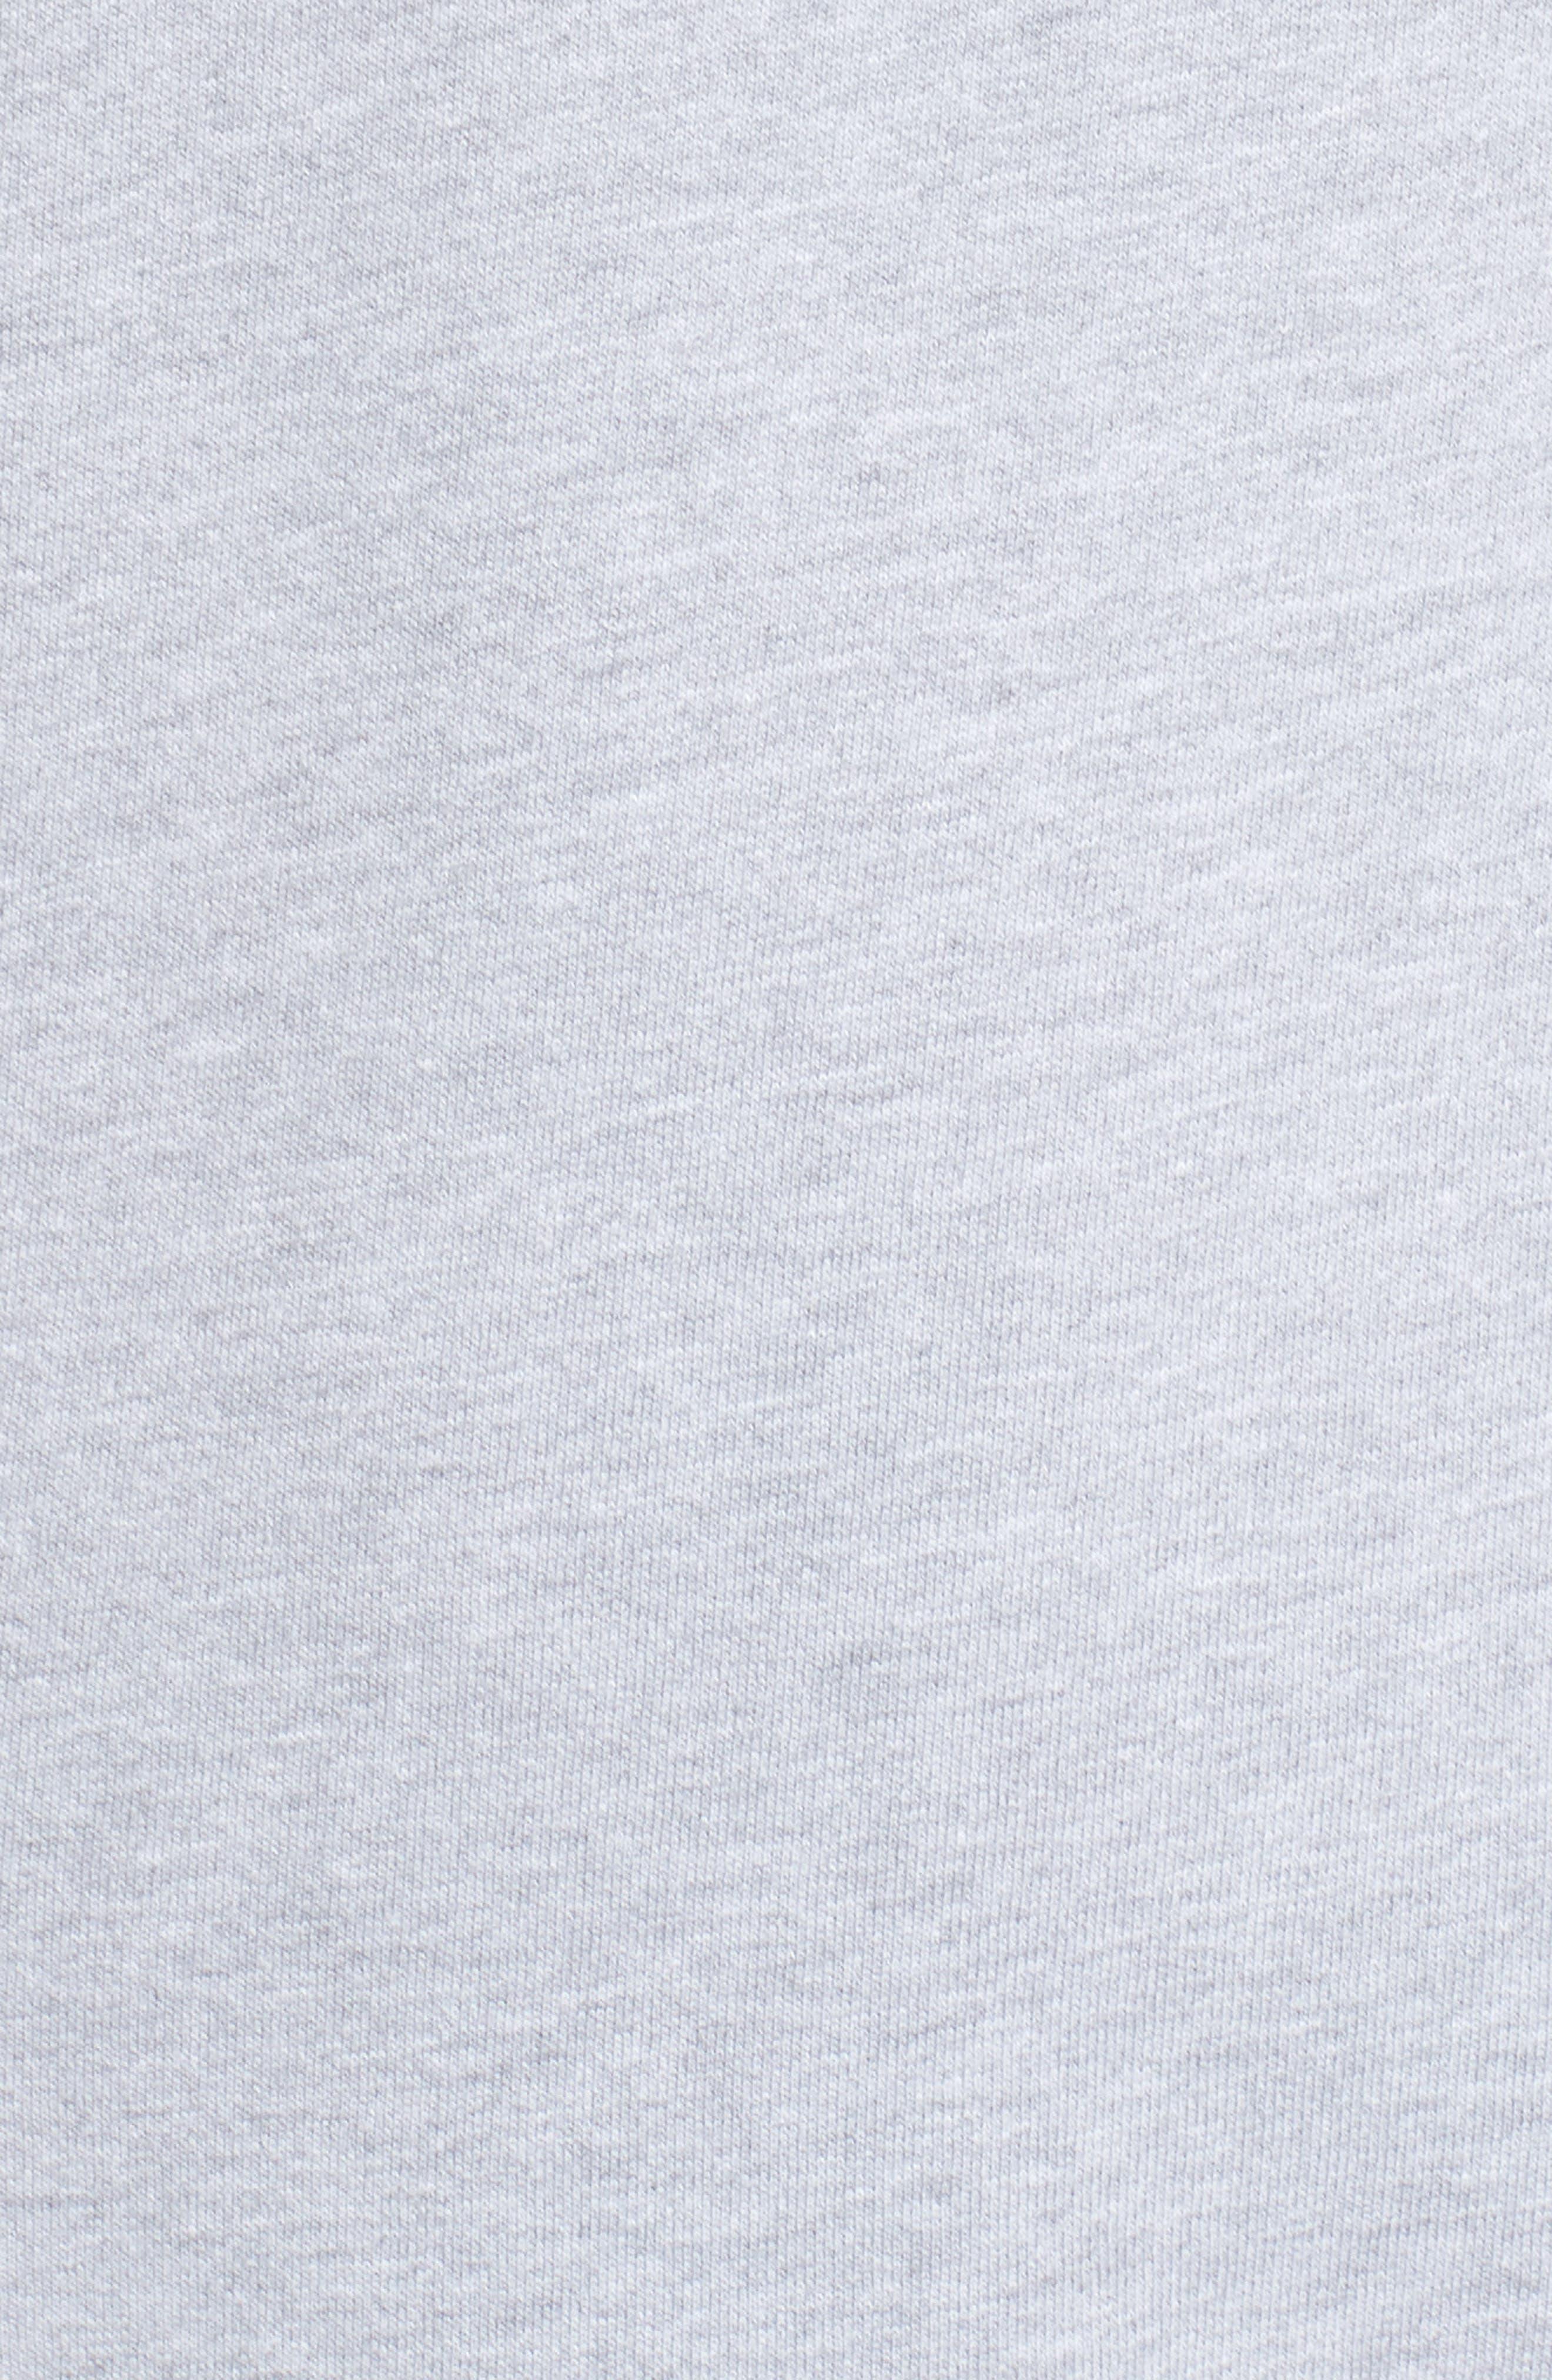 Boxy Oversize Sweatshirt,                             Alternate thumbnail 16, color,